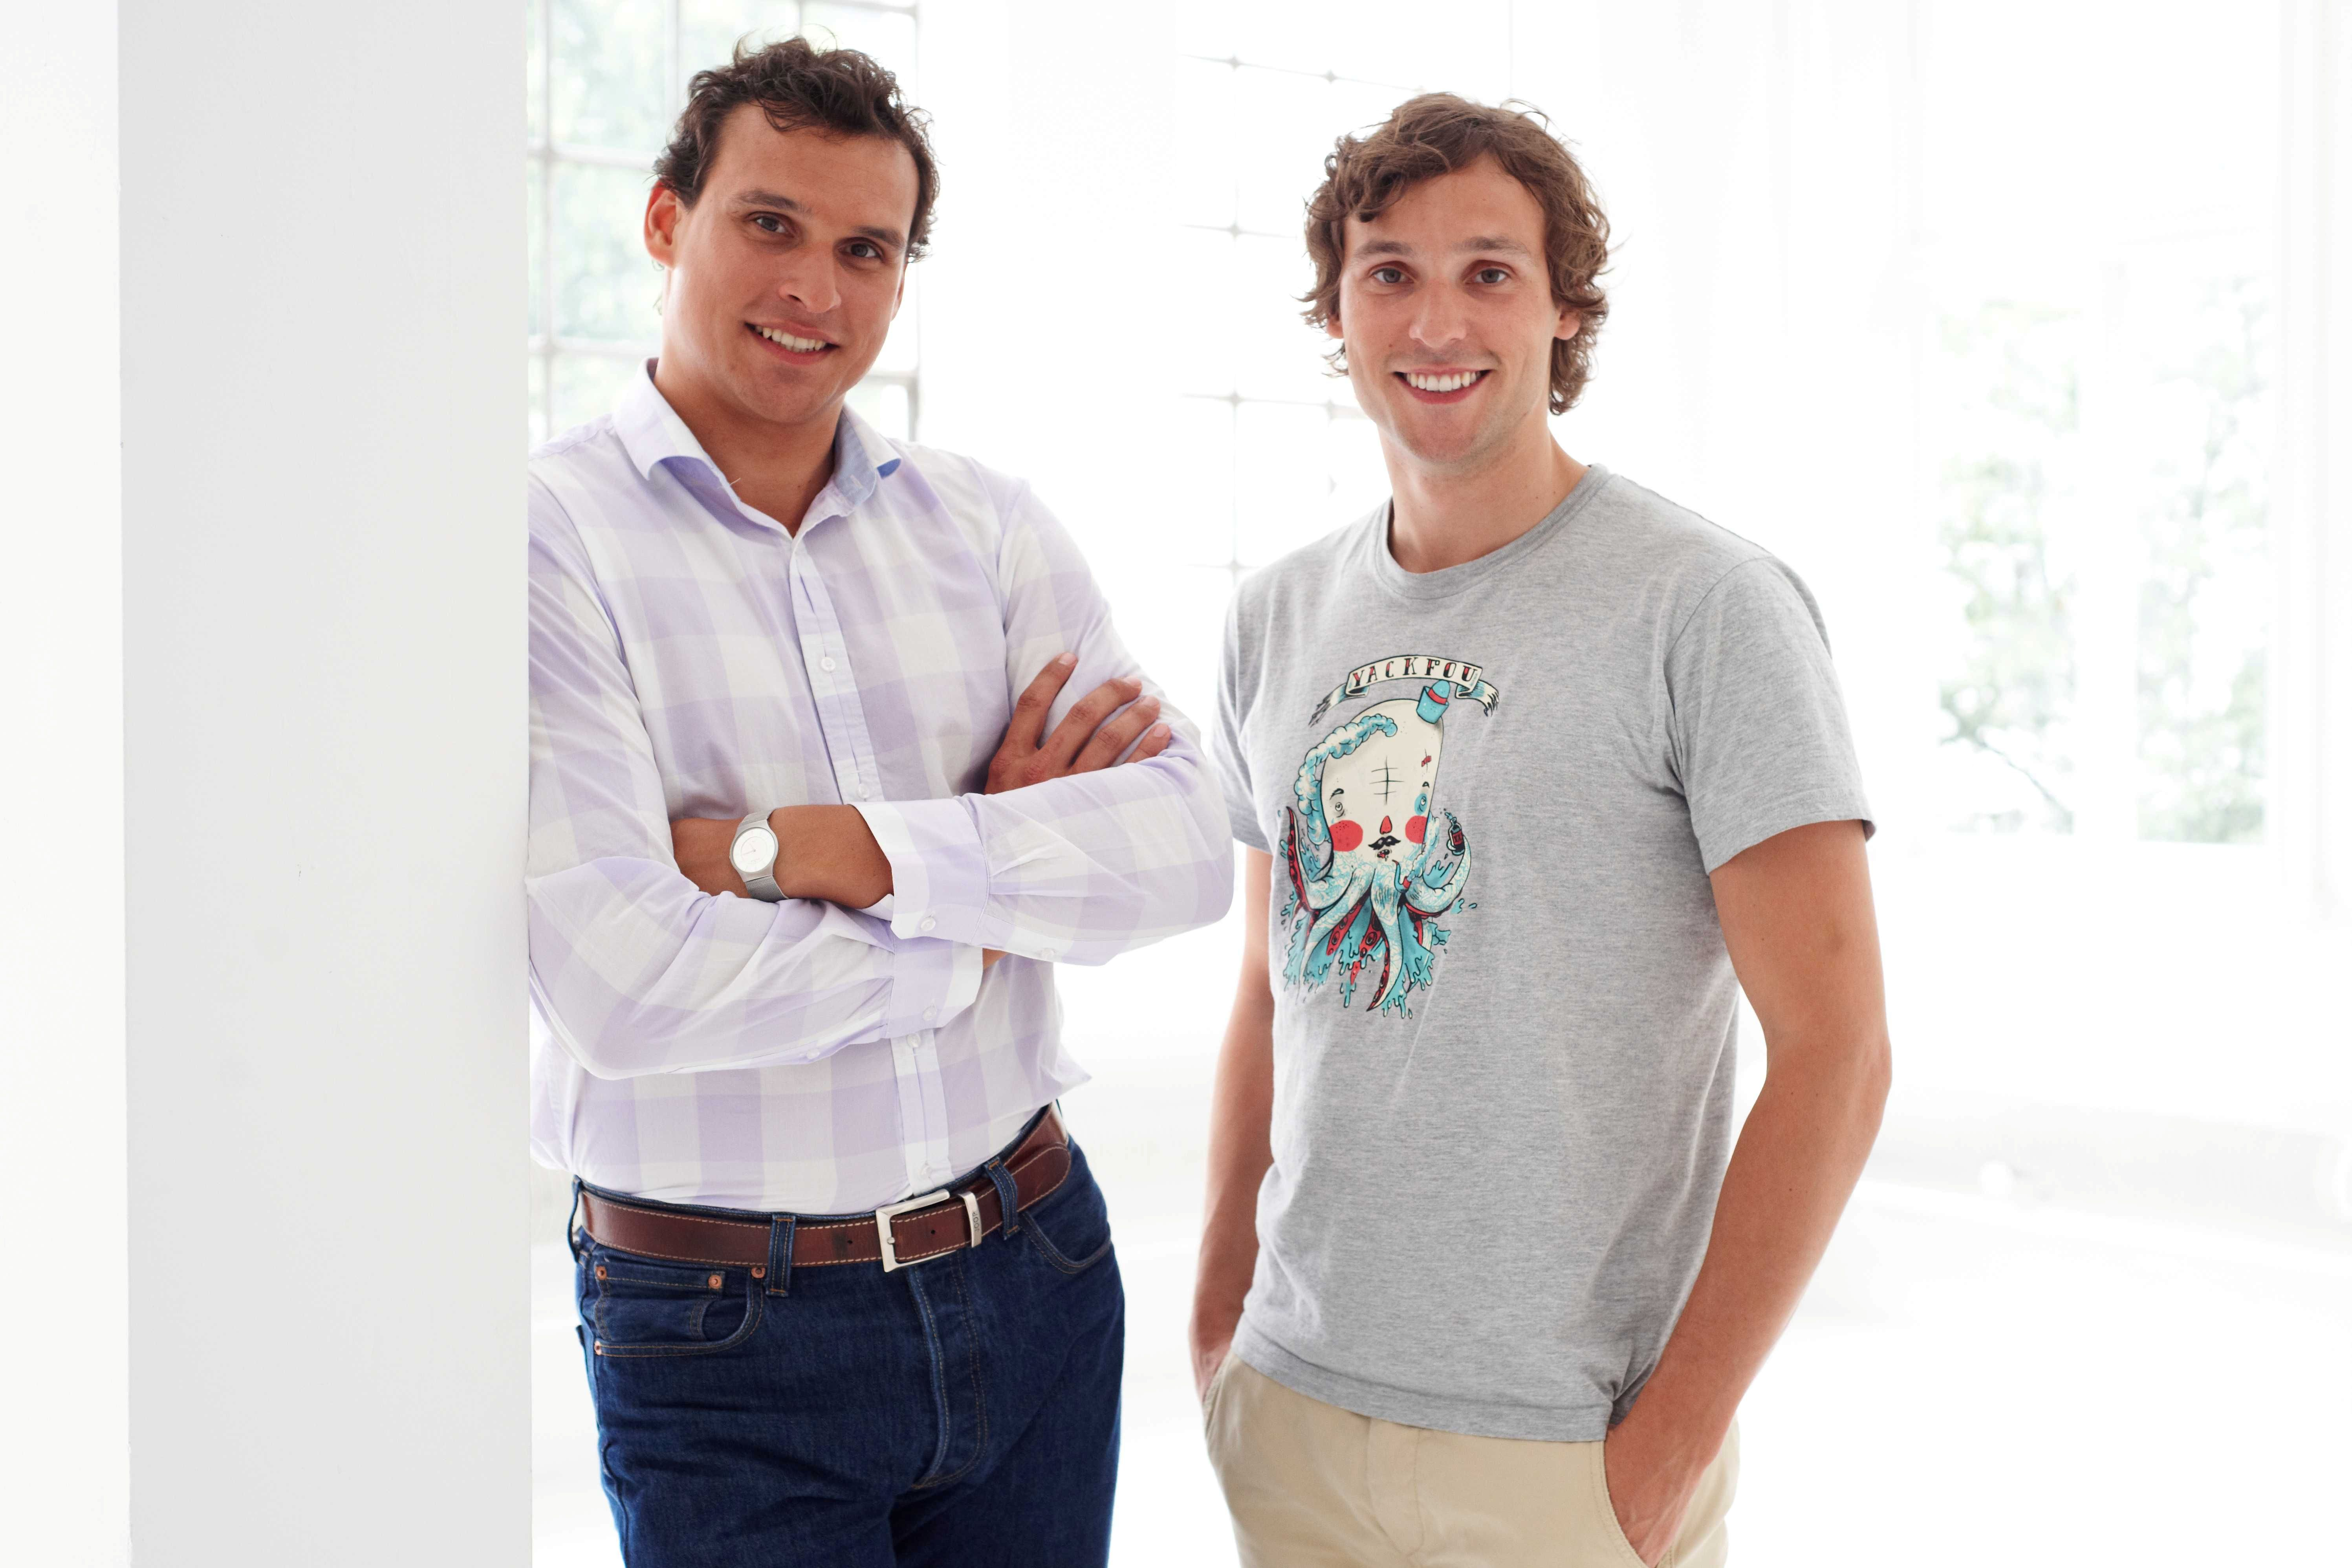 The founding team of Beyer & Söhne